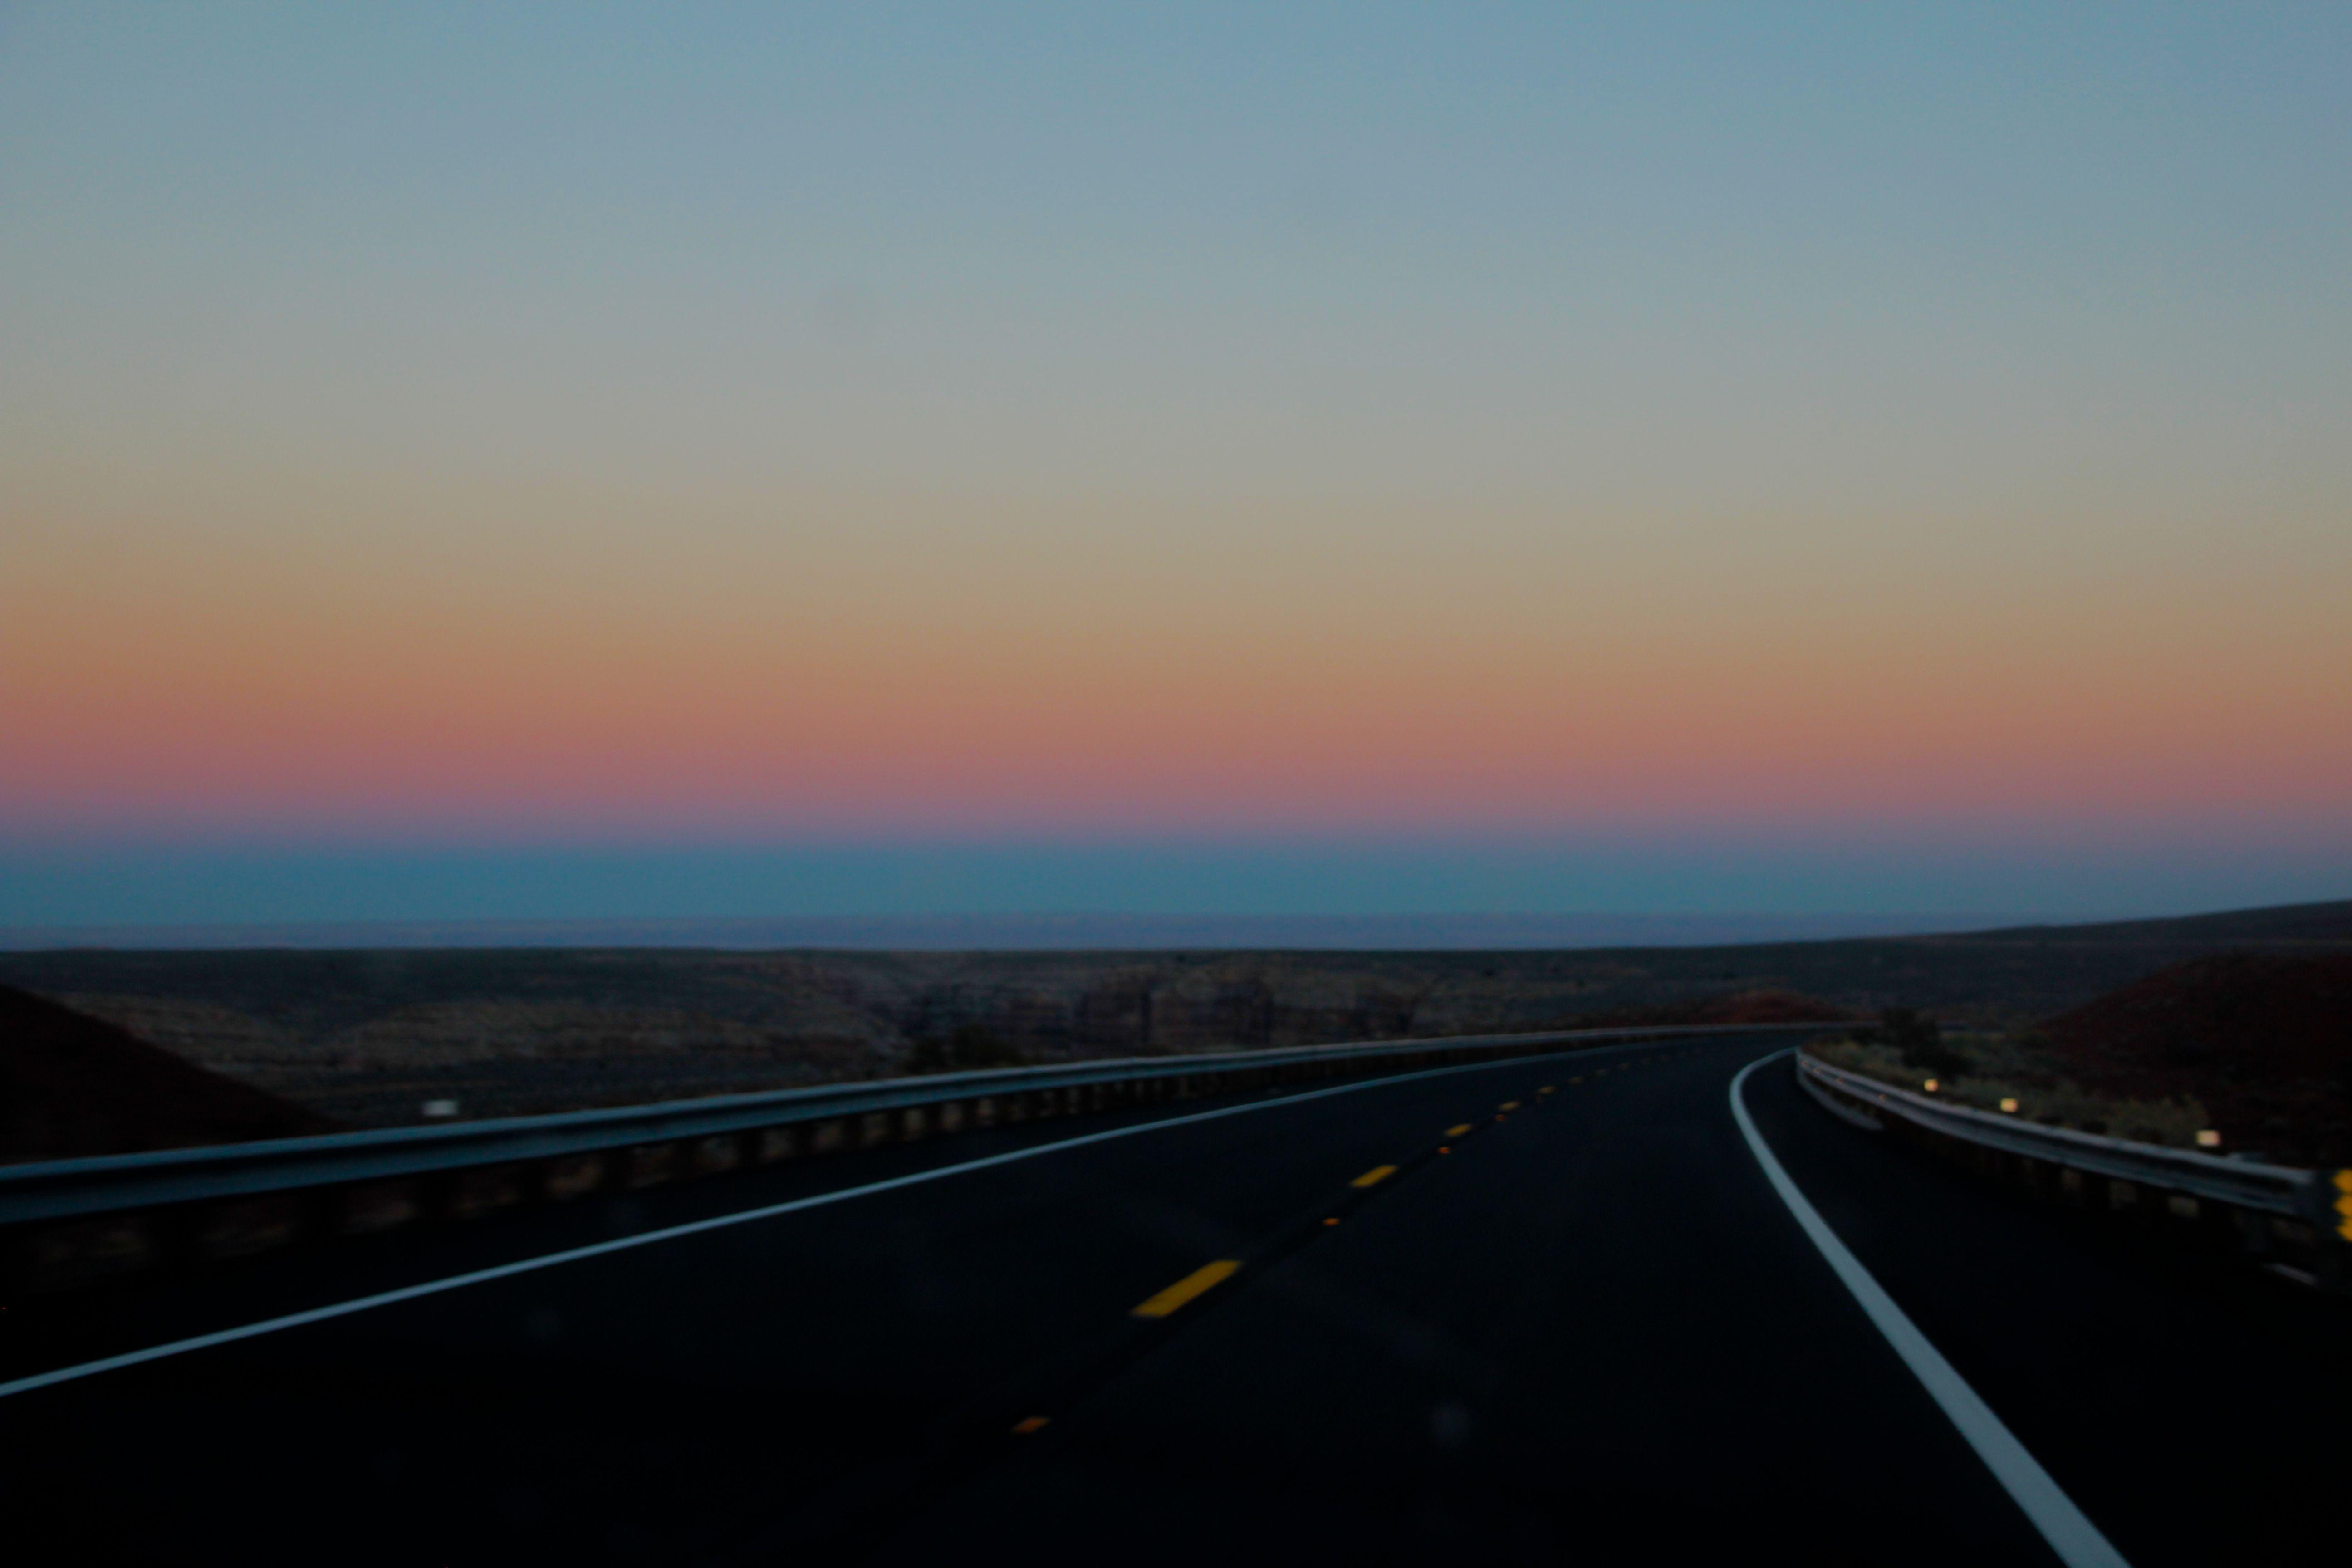 3 road trip sunset usa (c) upupup.fr